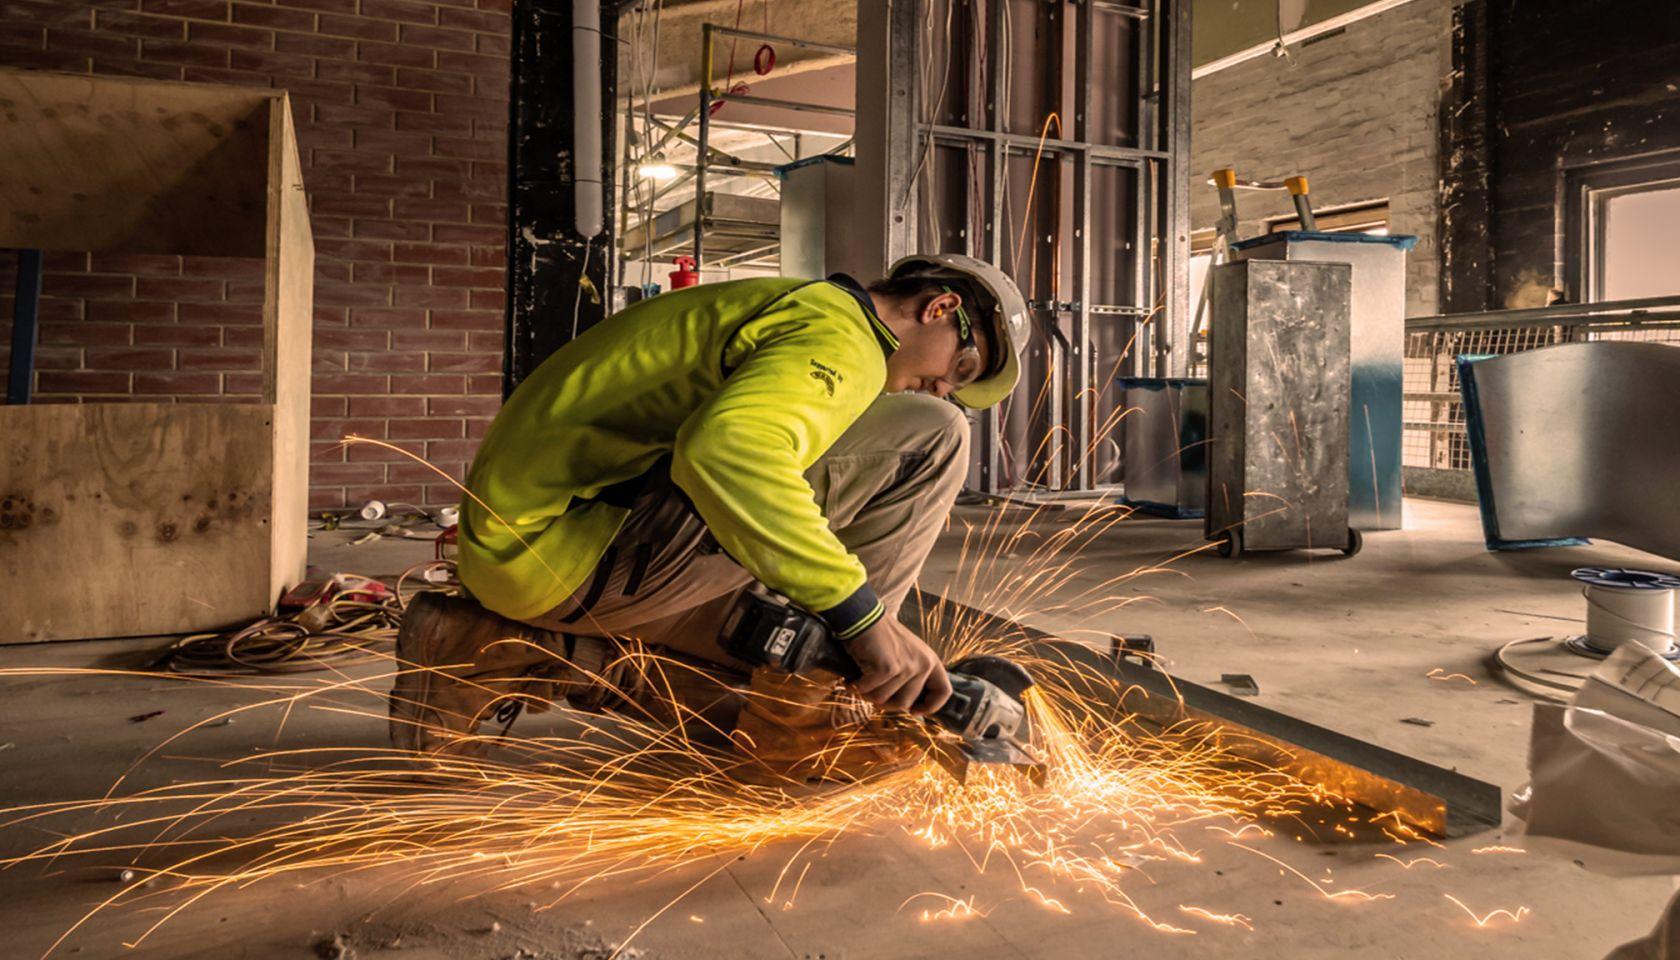 schiavello_construction_design_construct_service_construction_worker.jpg